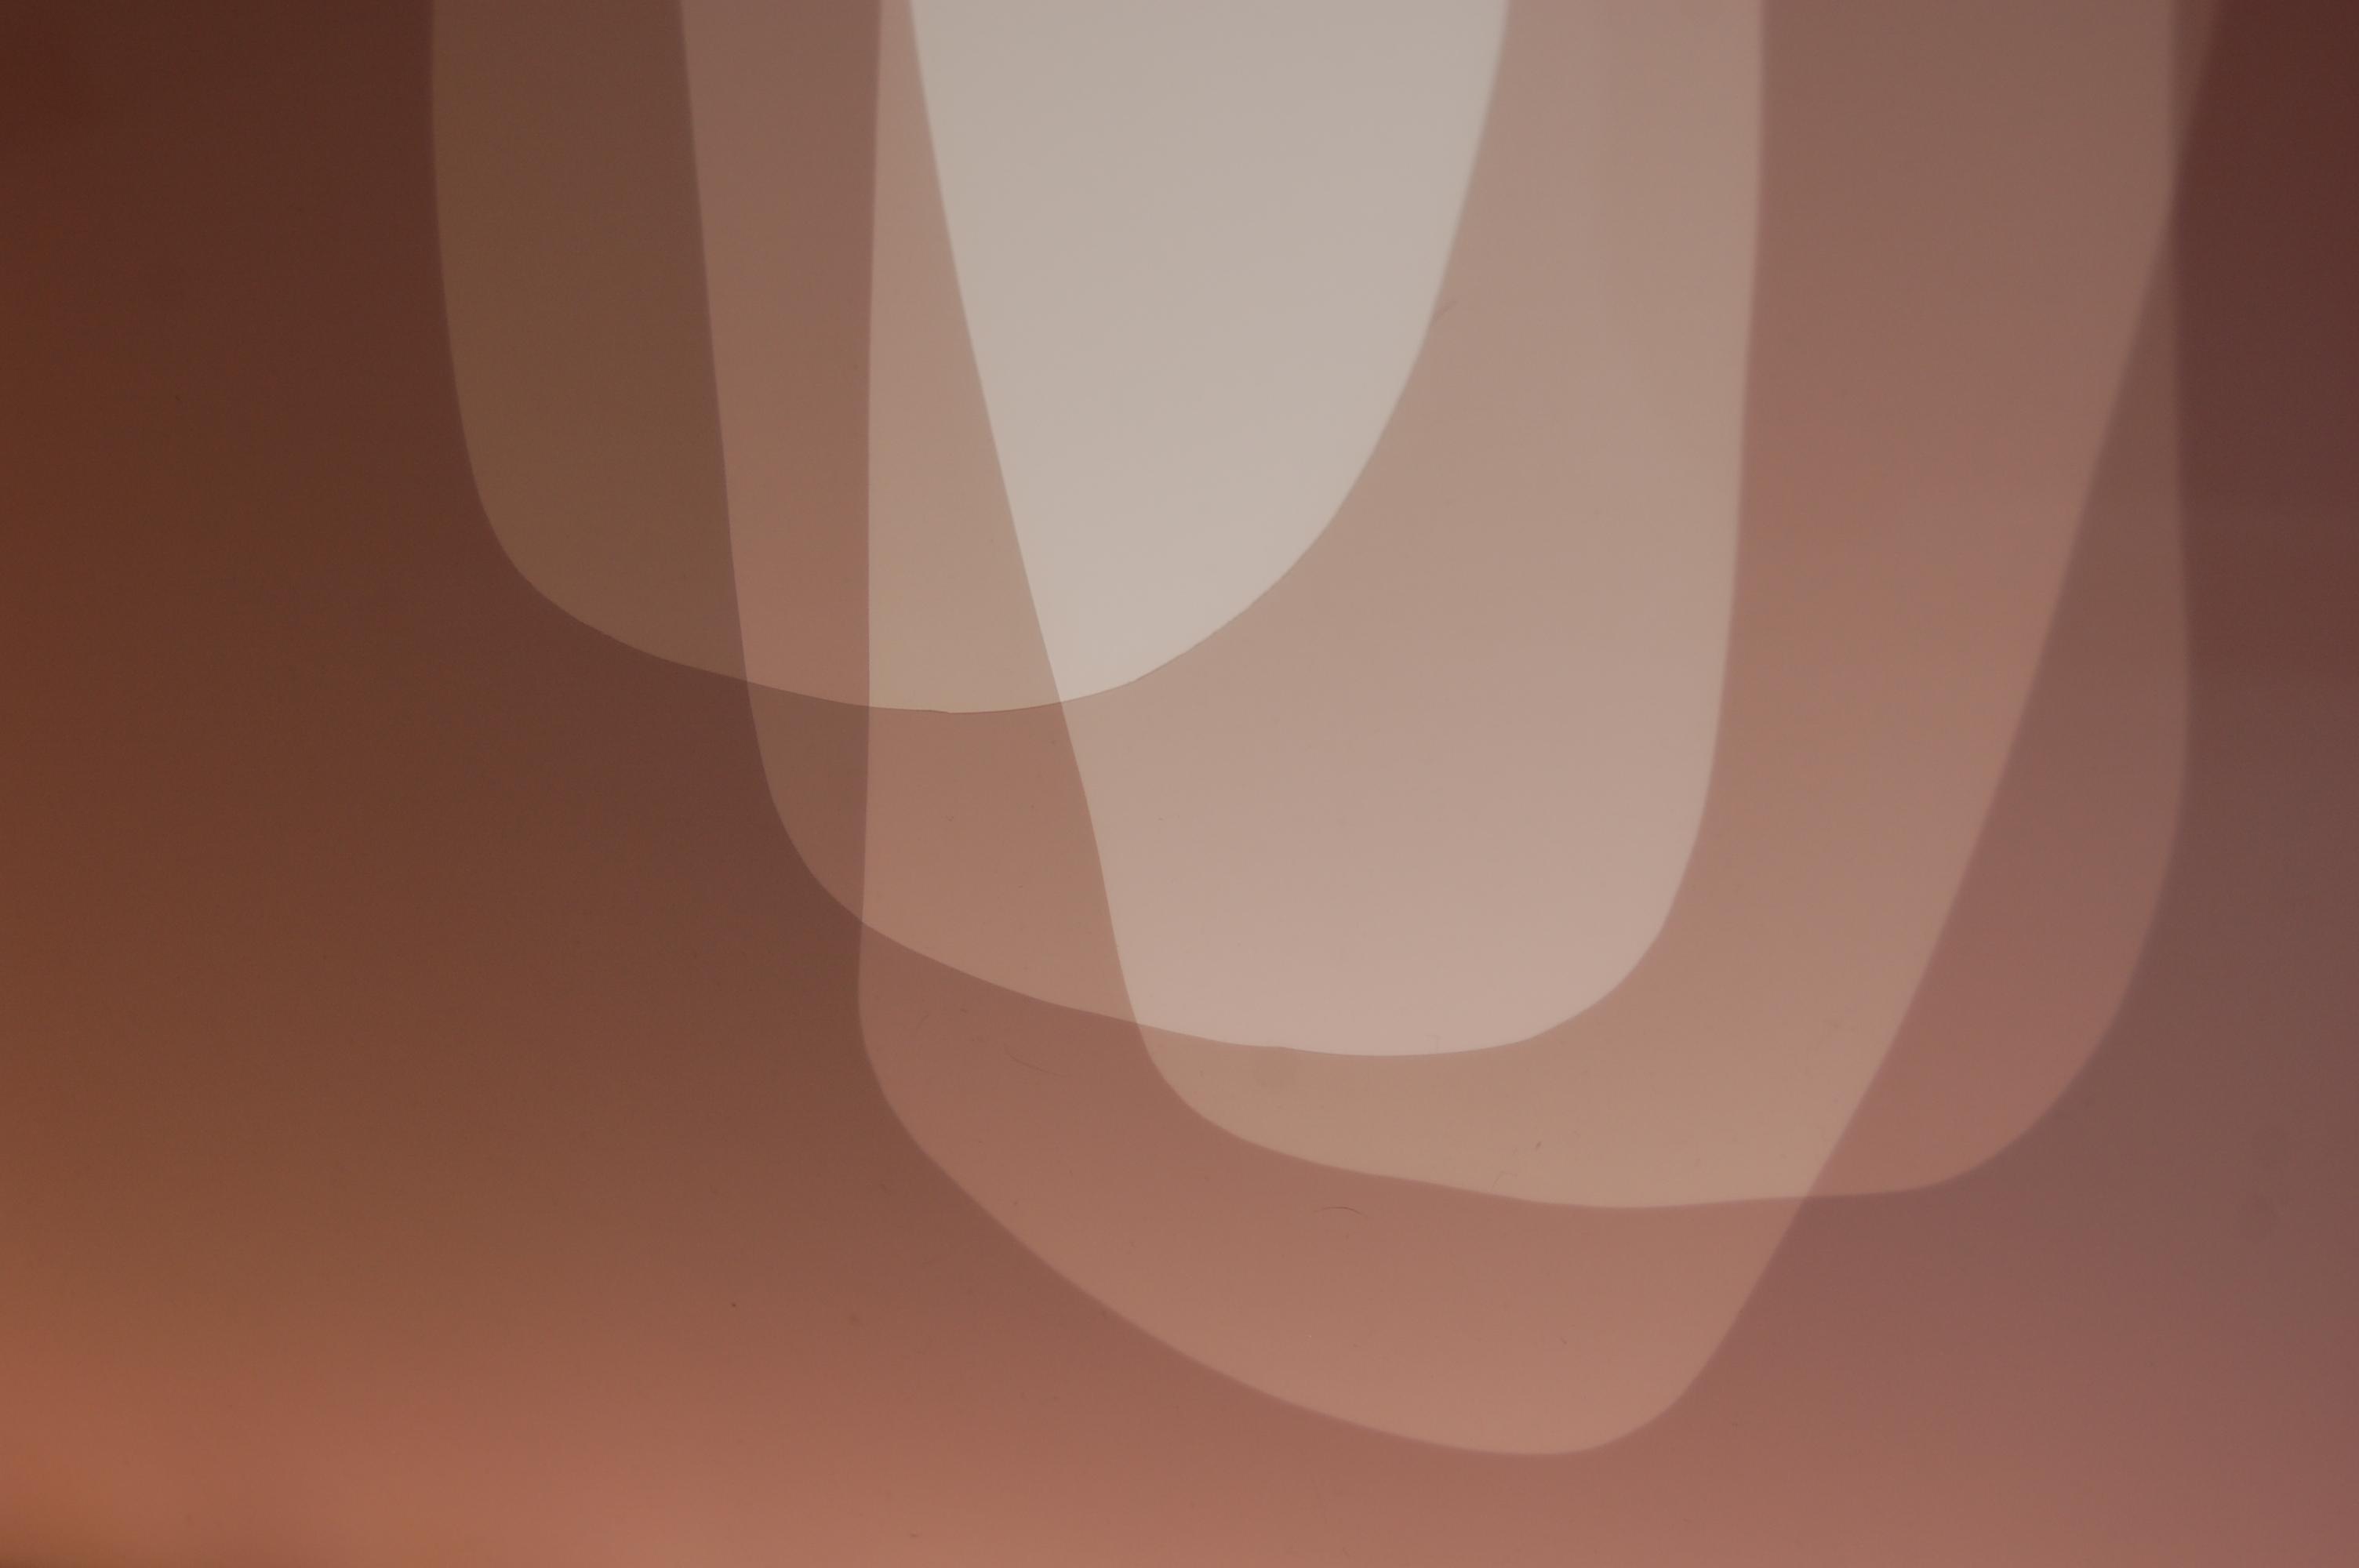 paula-del-rivero-modern-abstract-art_gyne1_detail3